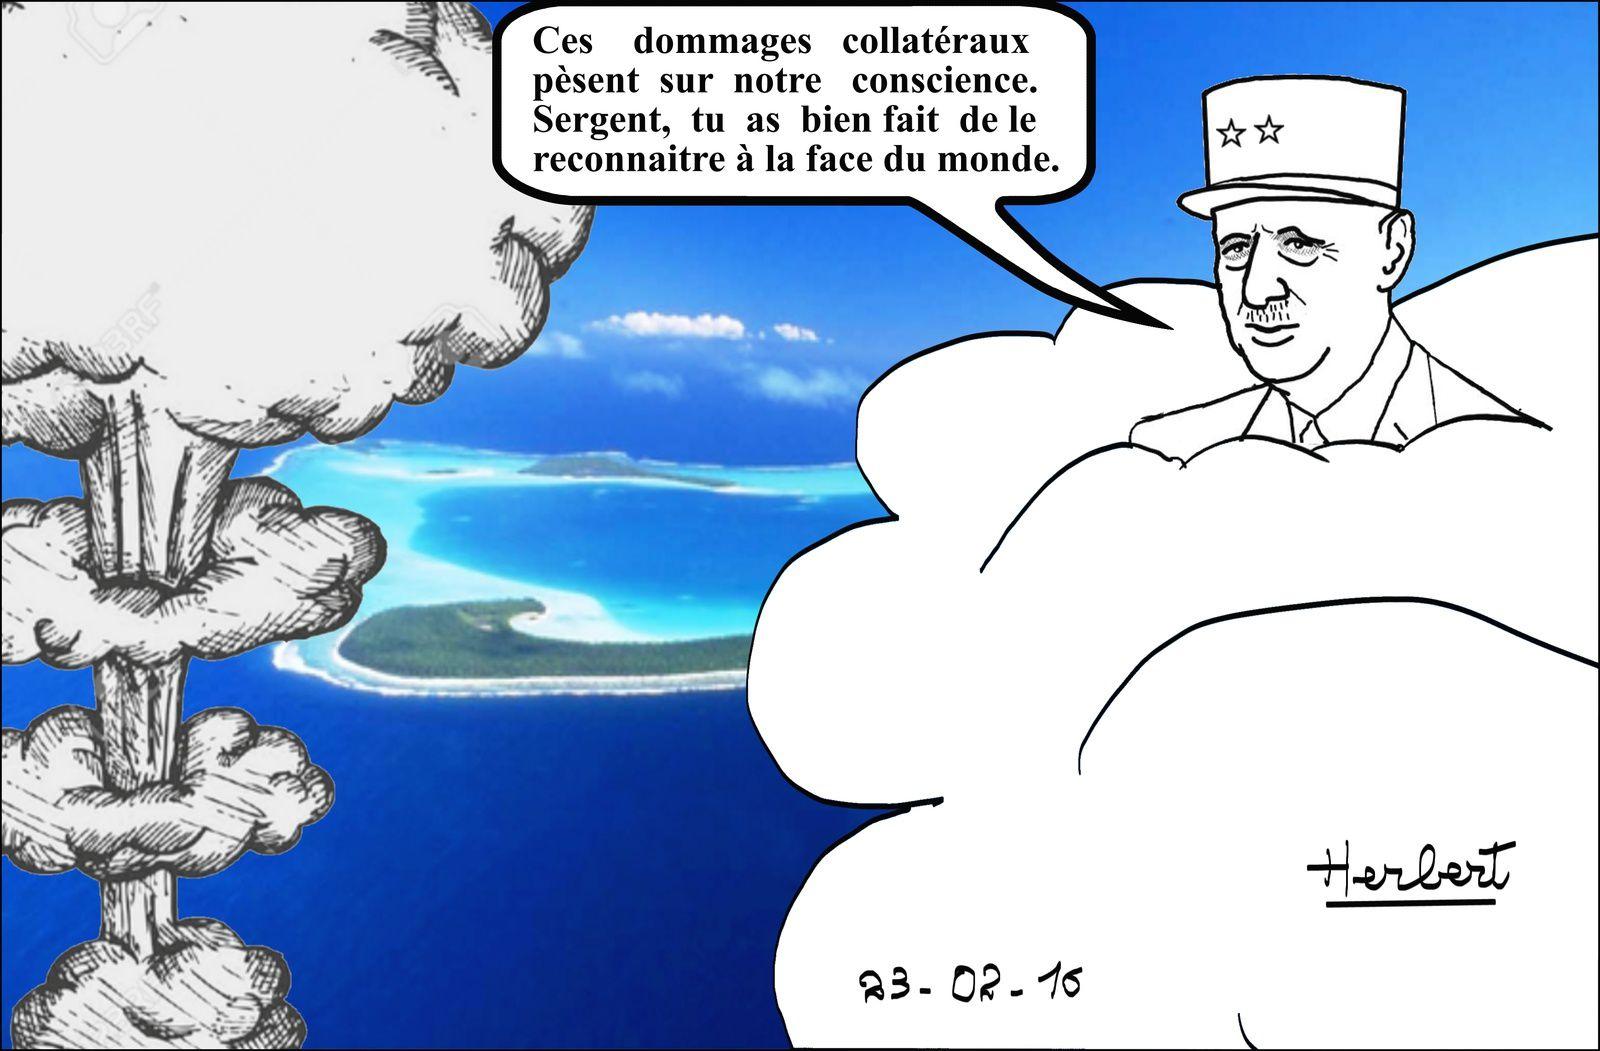 Dommages collatéraux en Polynésie